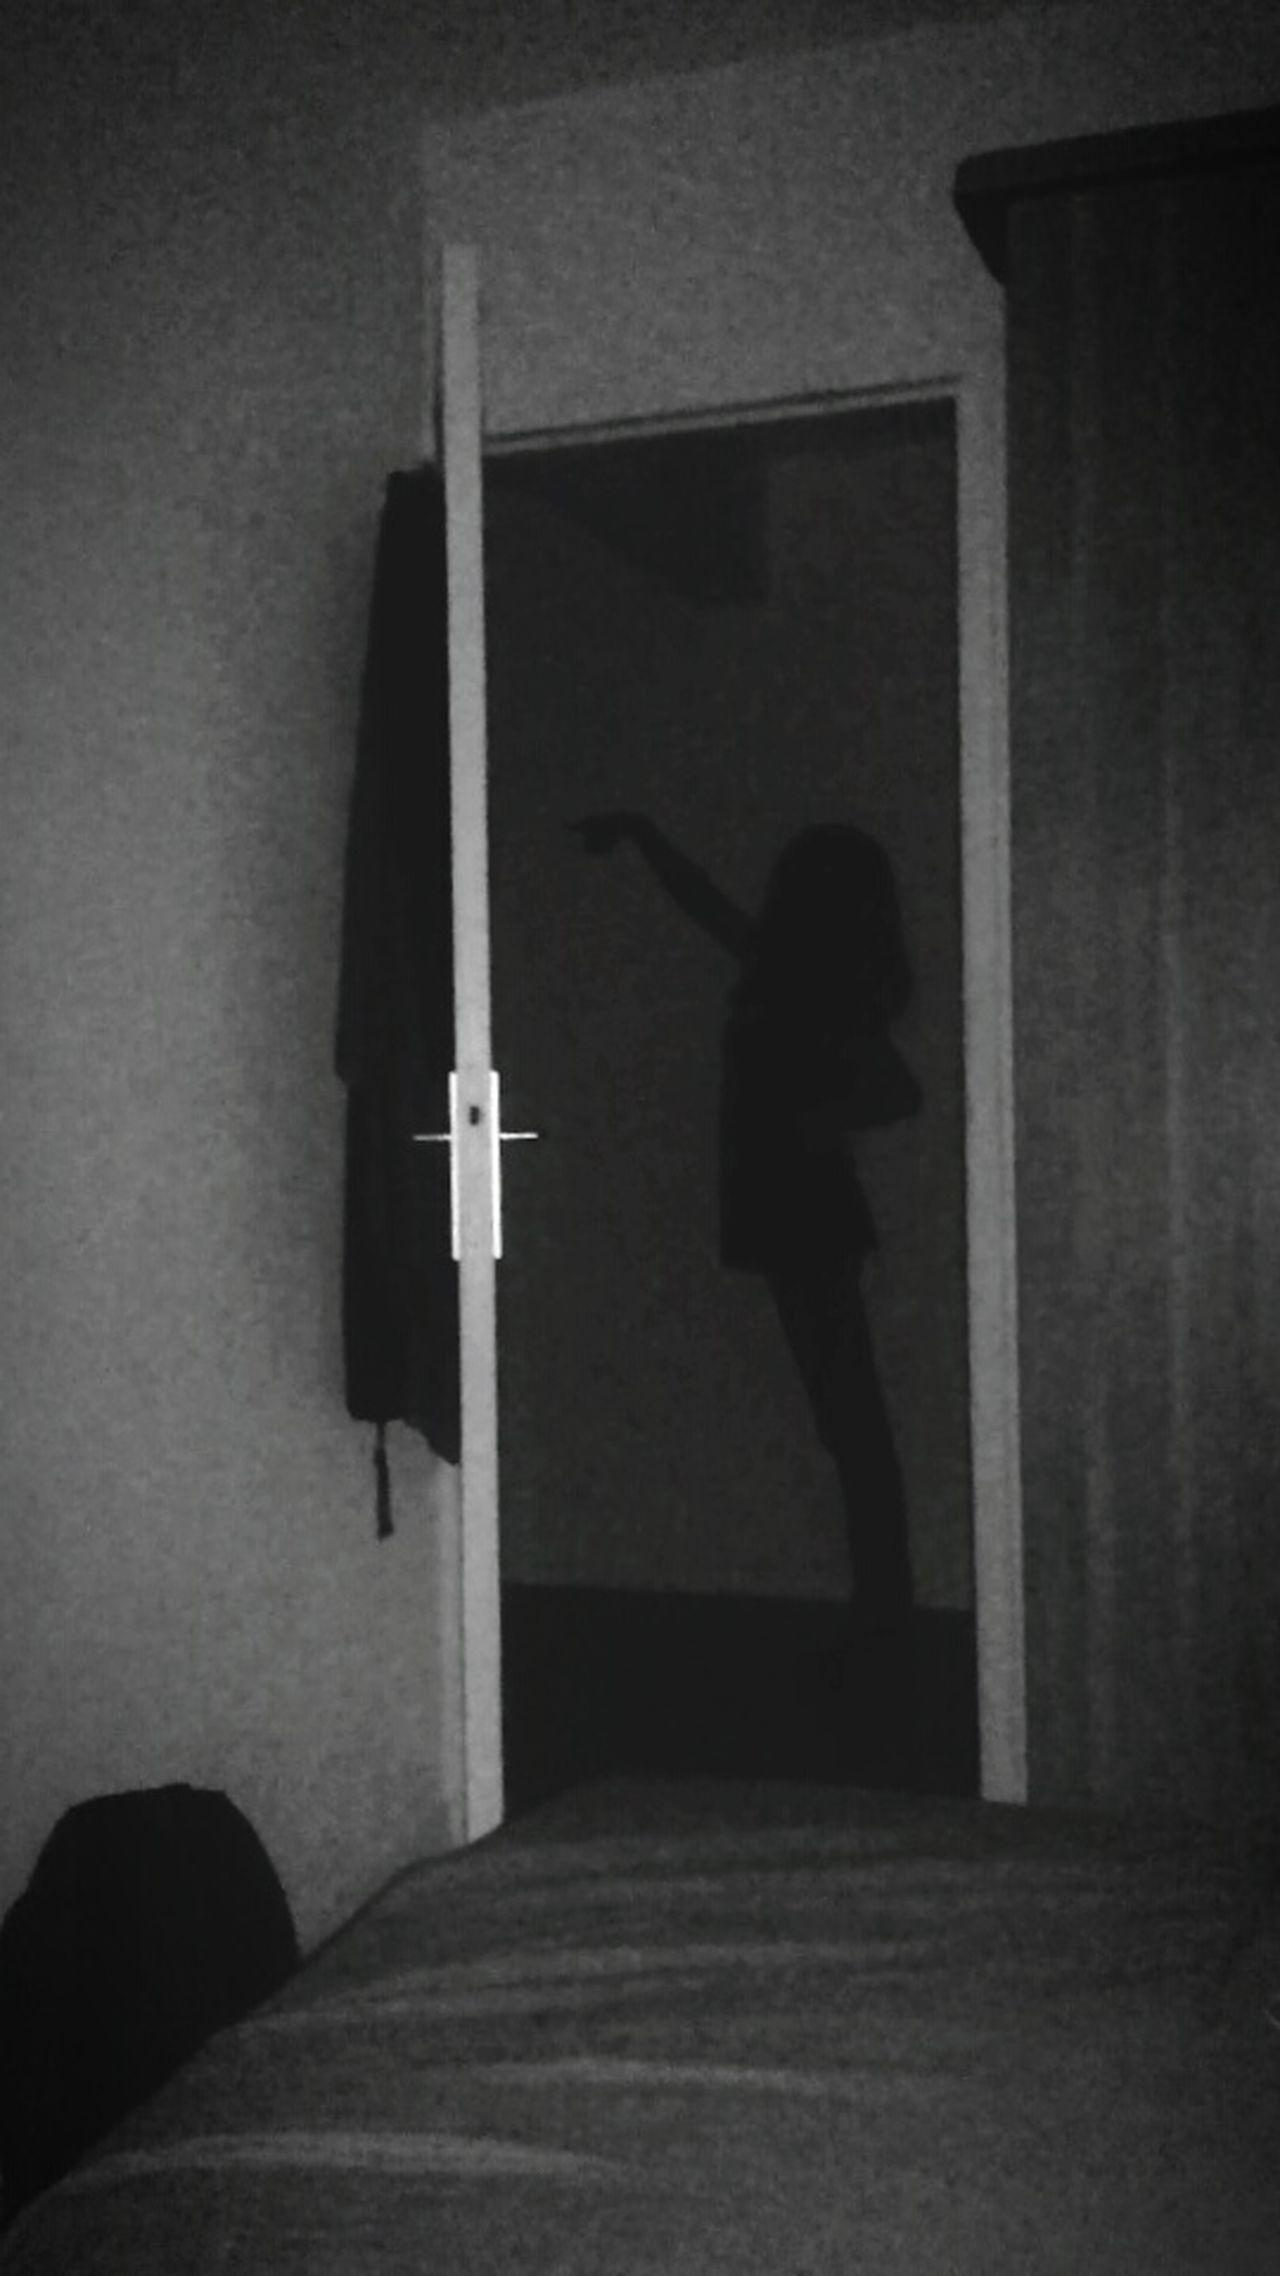 Photo Artisric Girl Shoot Perfect Day Night Sad